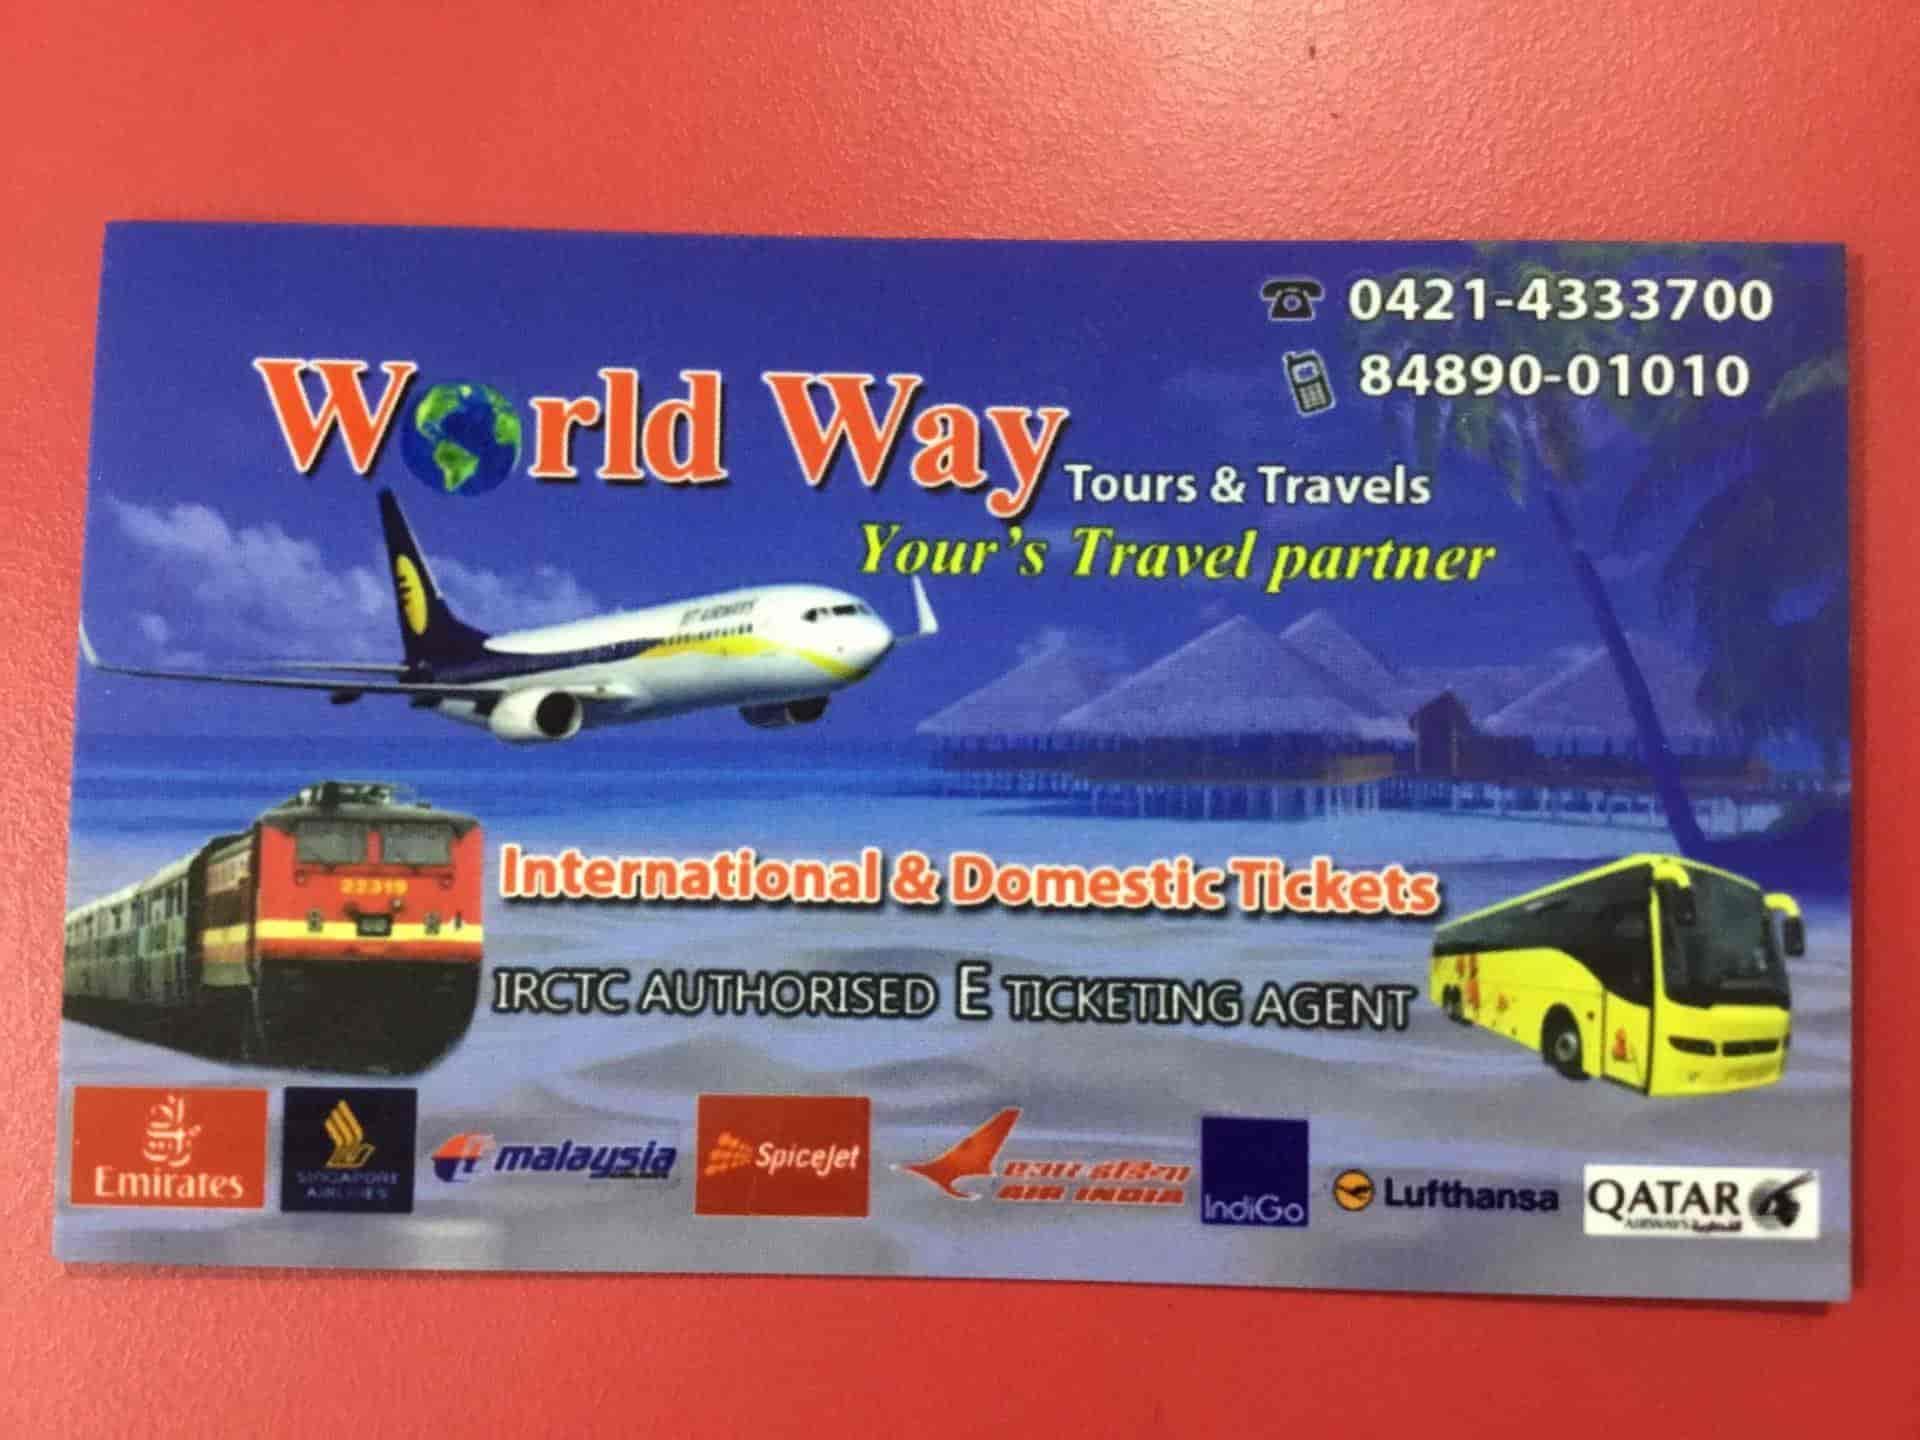 World Way Tours Travels Photos Pn Road Tirupur Pictures Images Kaos Aeroplain Travel Agents